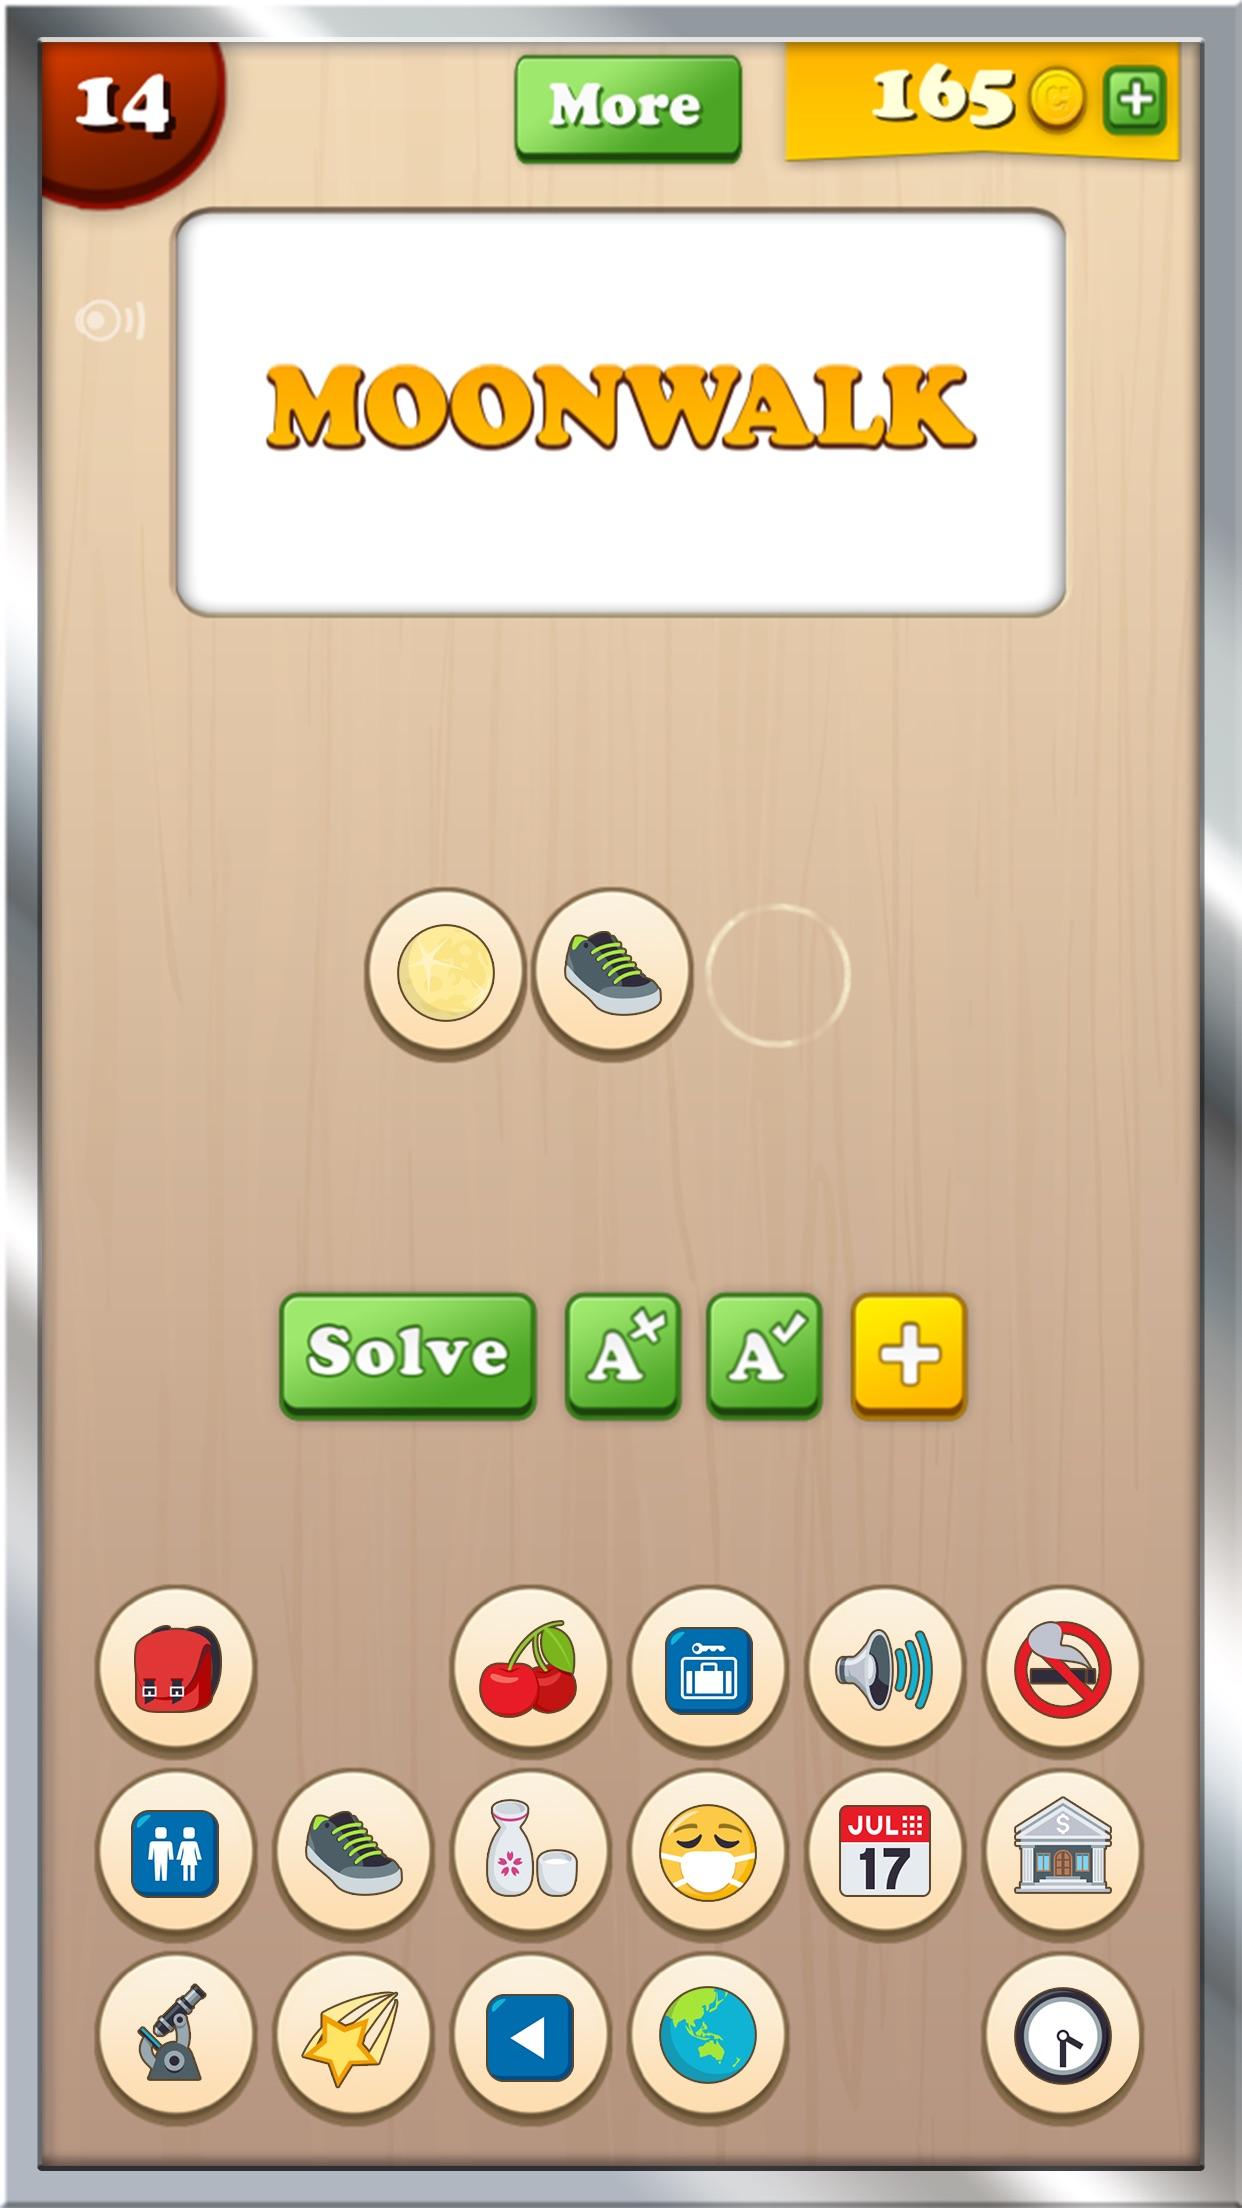 Emoji Games - Find the Emojis - Guess Game Screenshot